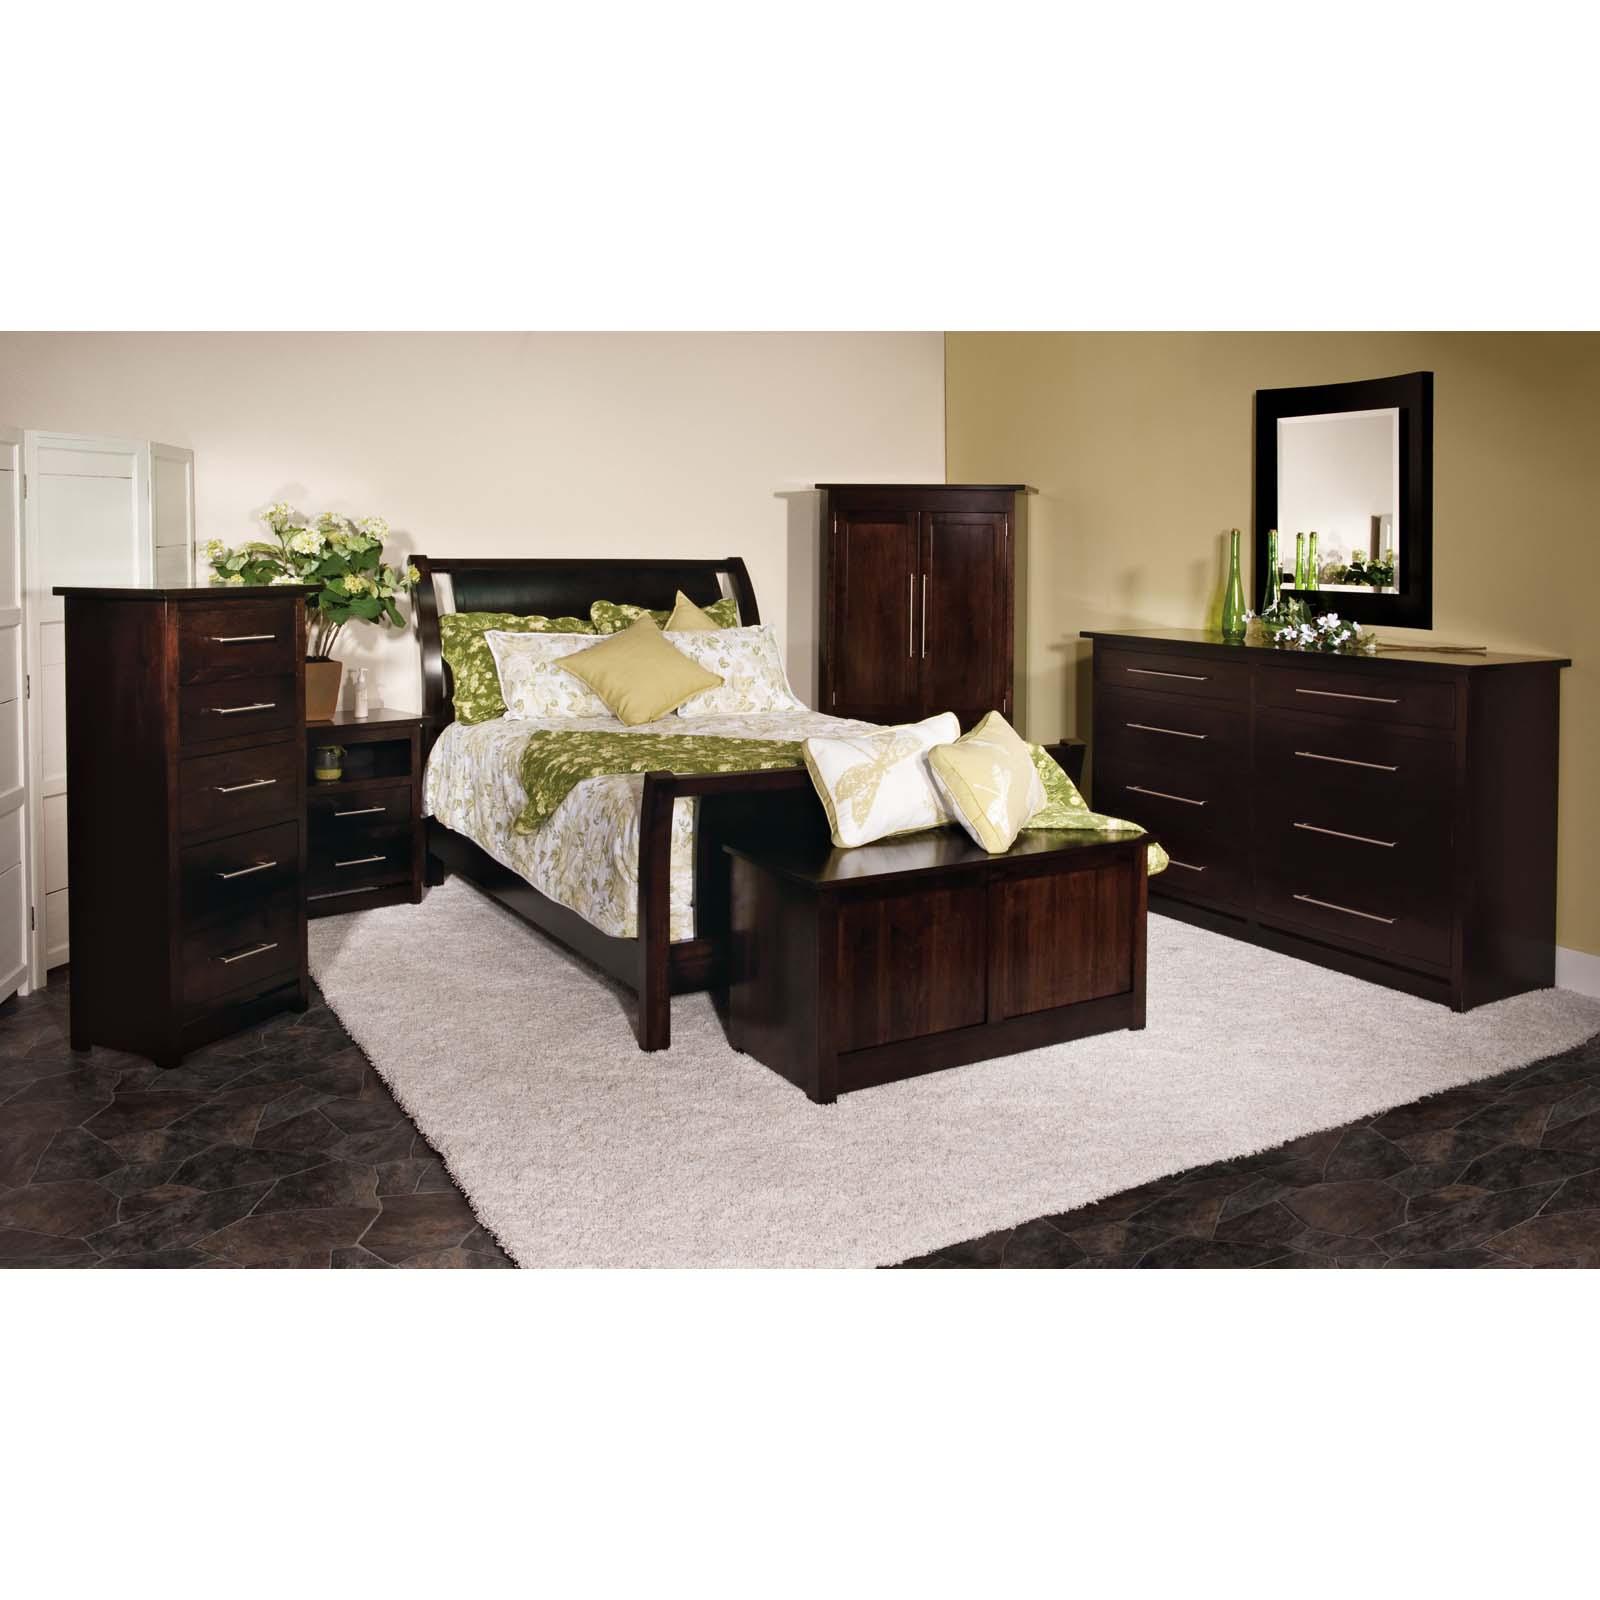 Amish Bedroom Stewart Roth Furniture